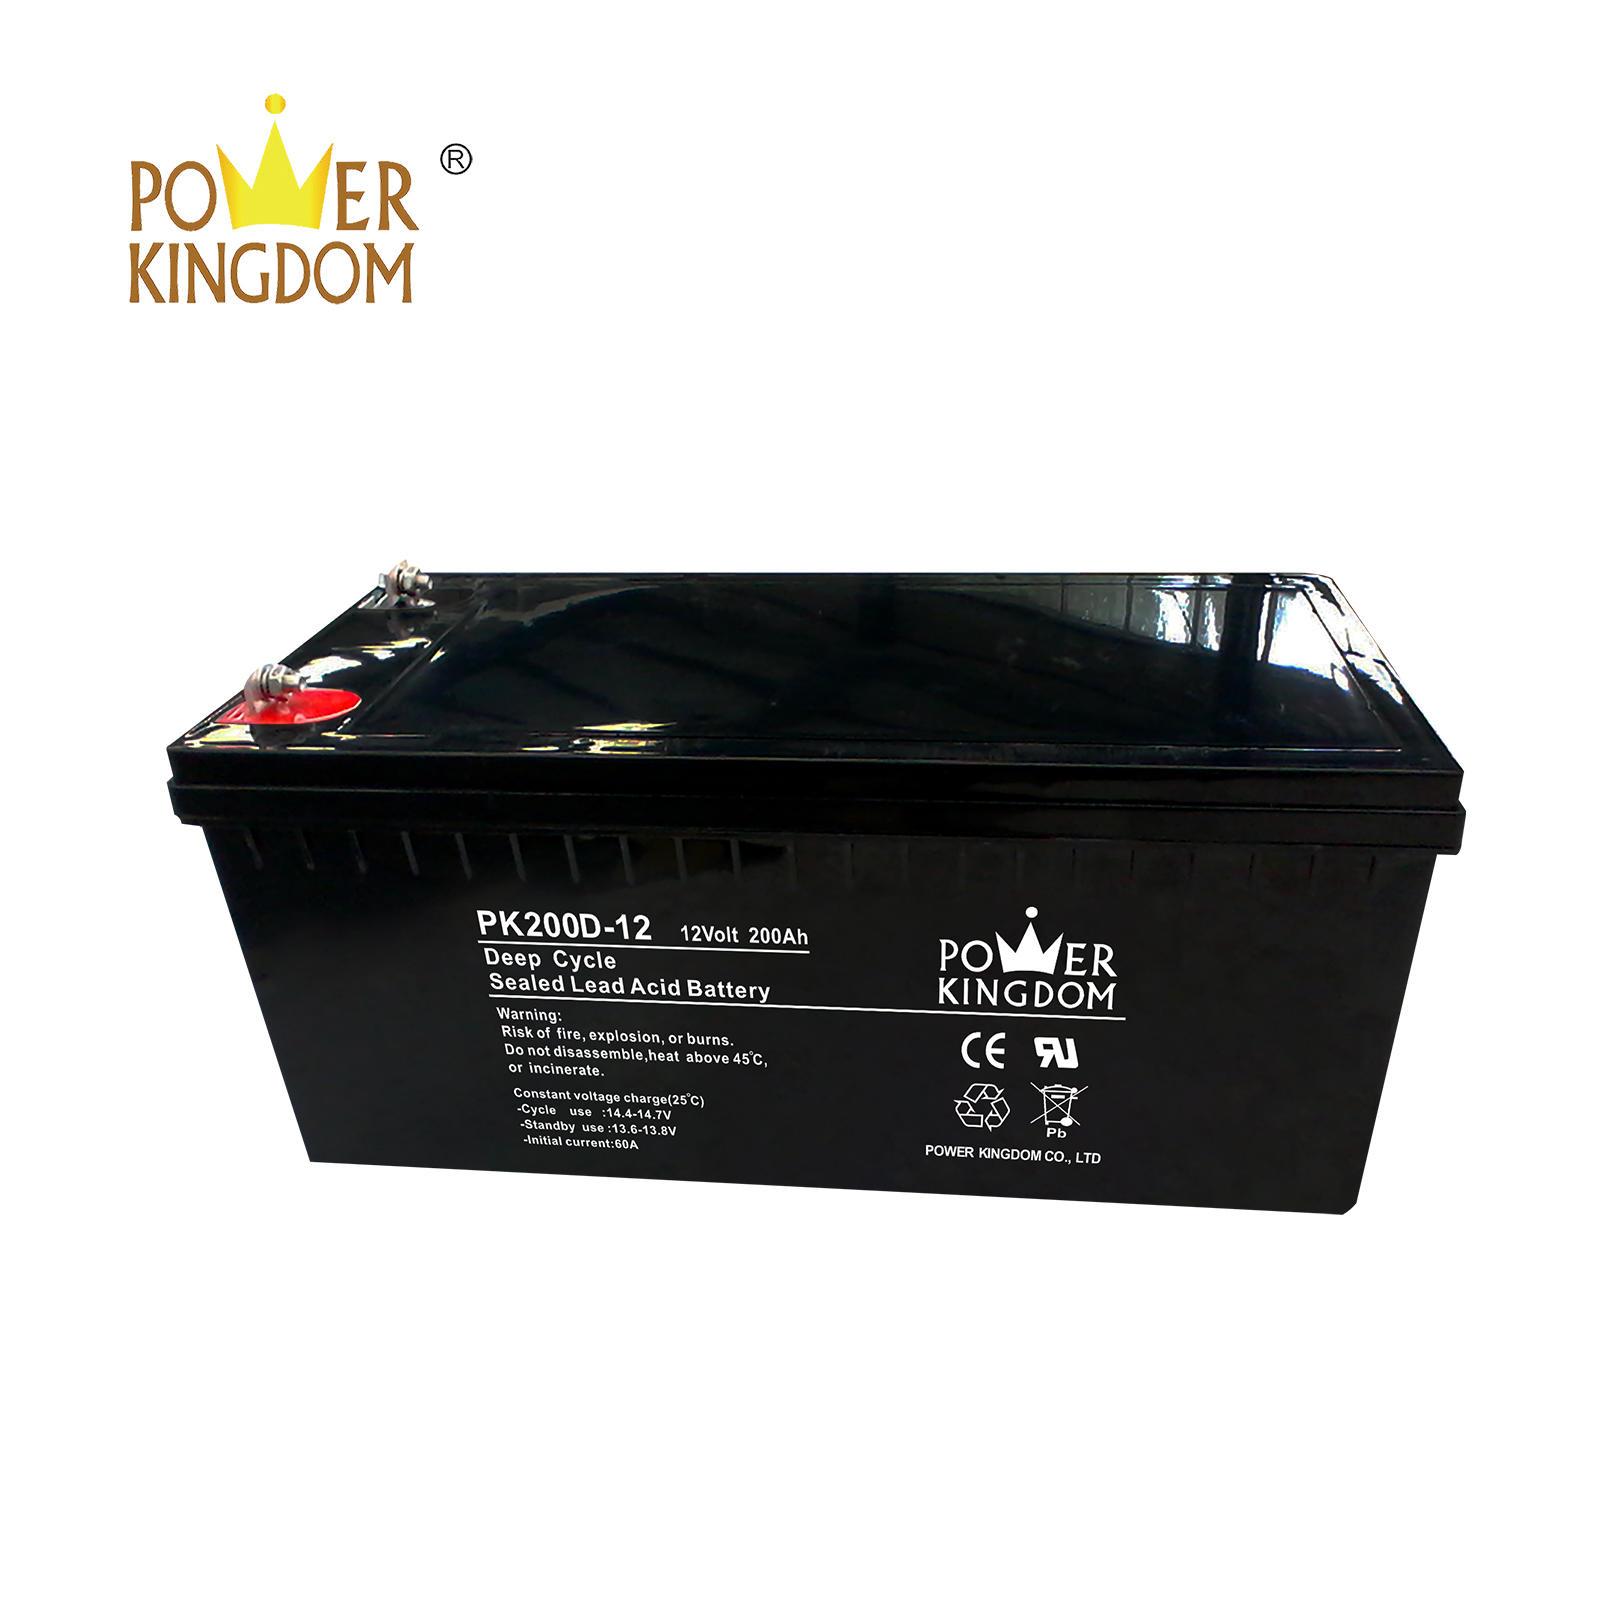 12v 200ah agm vrla deep cycle gel battery for solar system inverter ups application